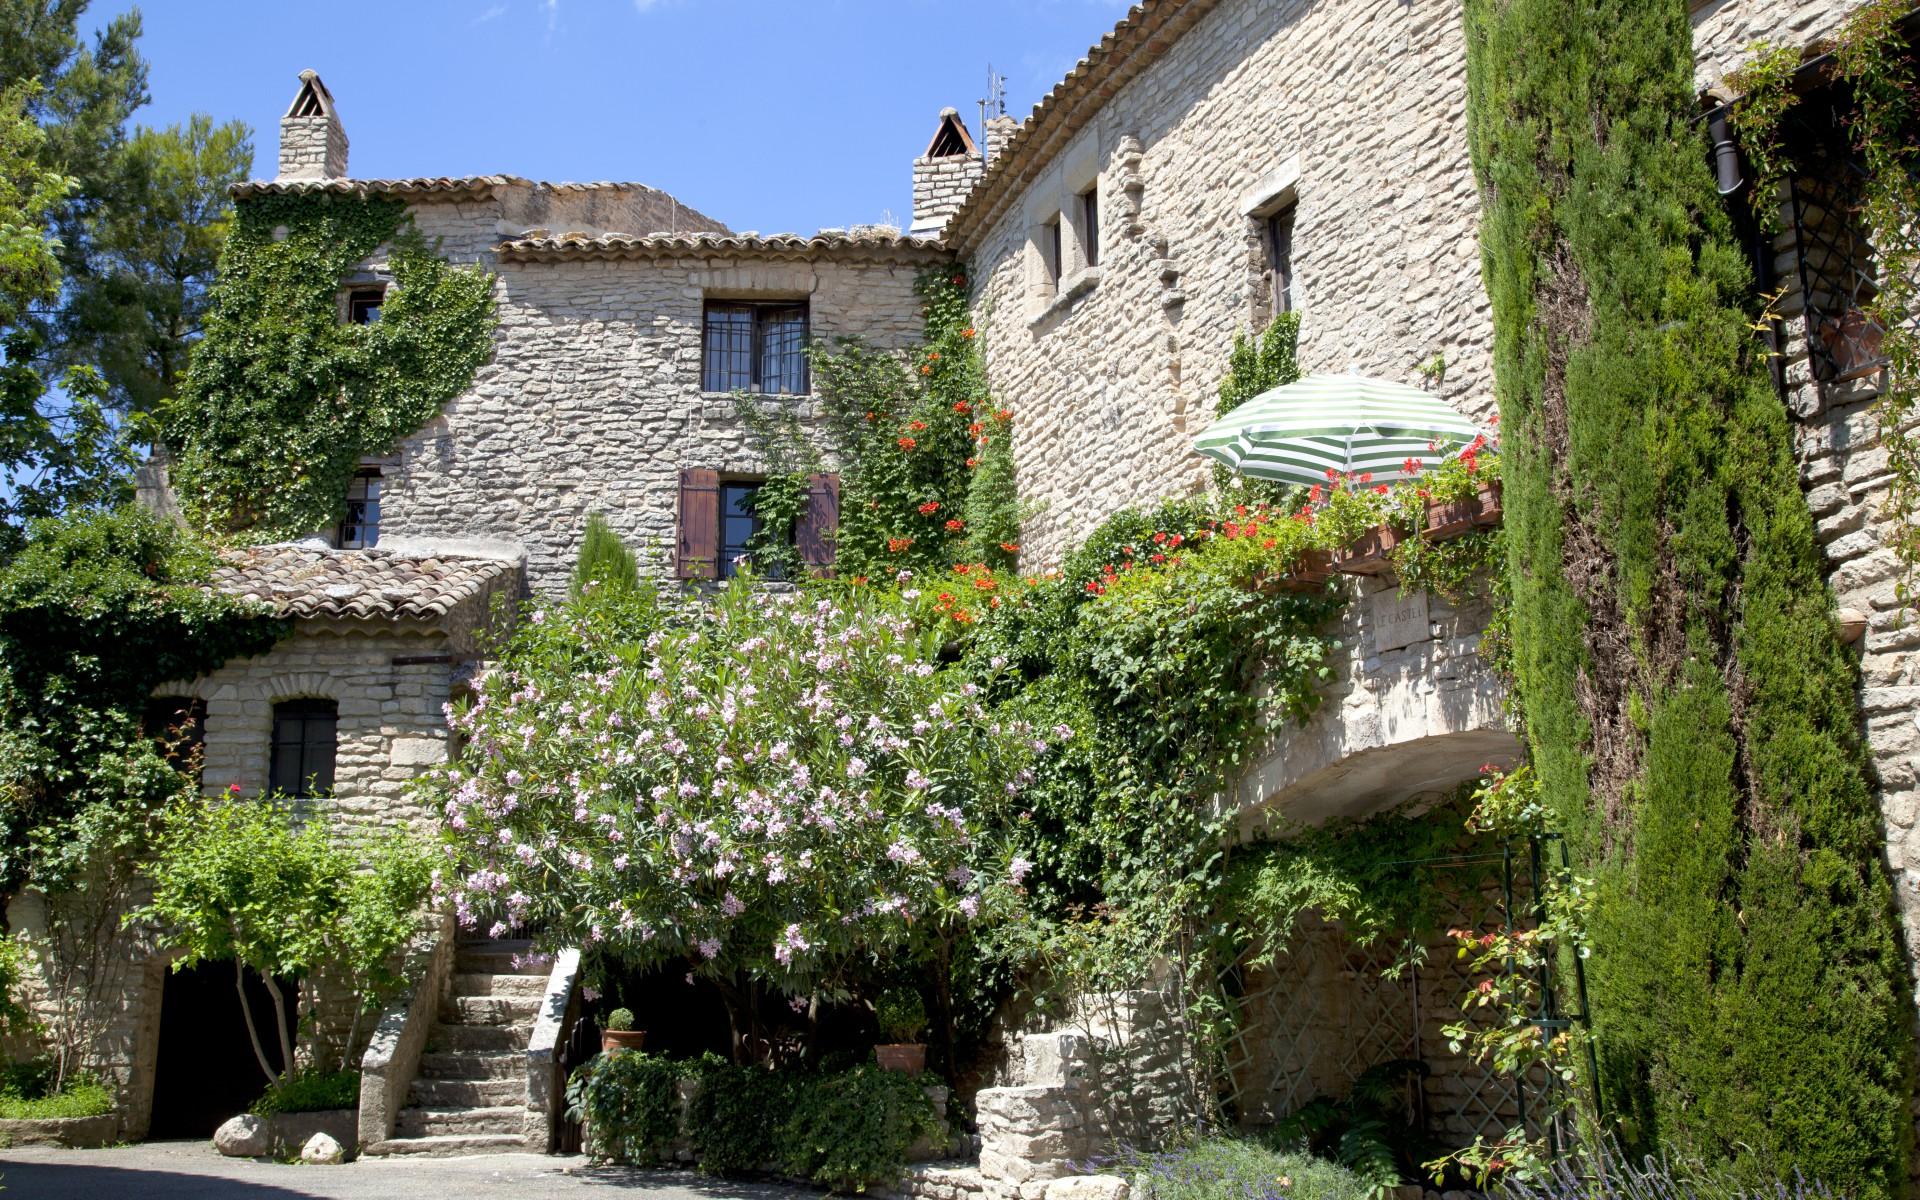 Garten Provence unterkünfte garten europa